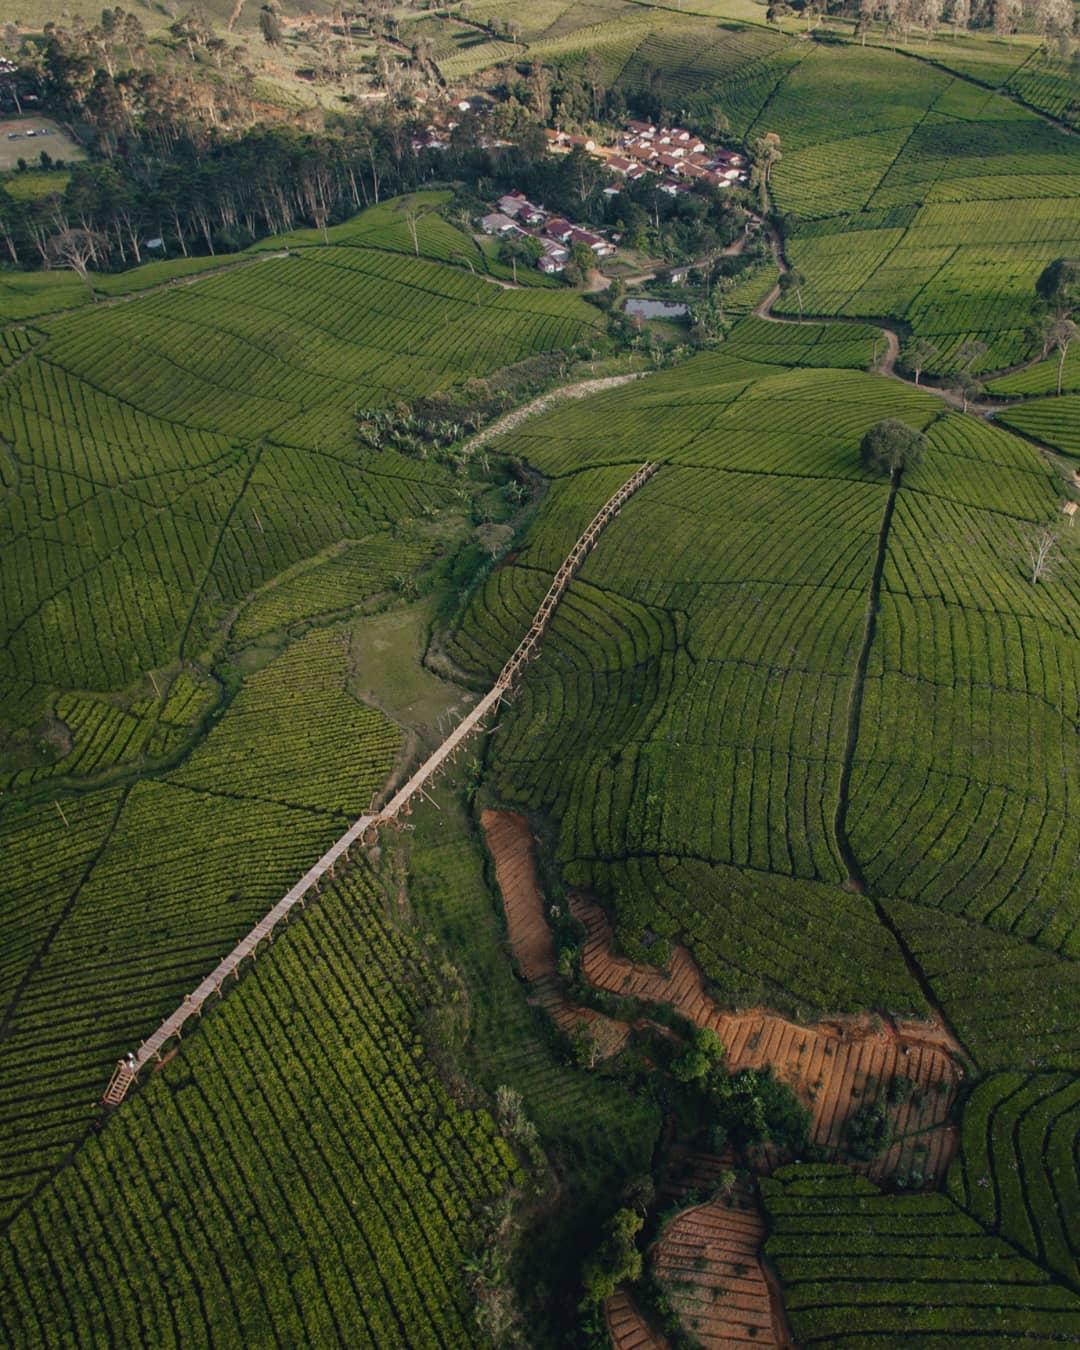 Riung Gunung Bandung Dilihat Dari Atas Image From @sobar_rdn